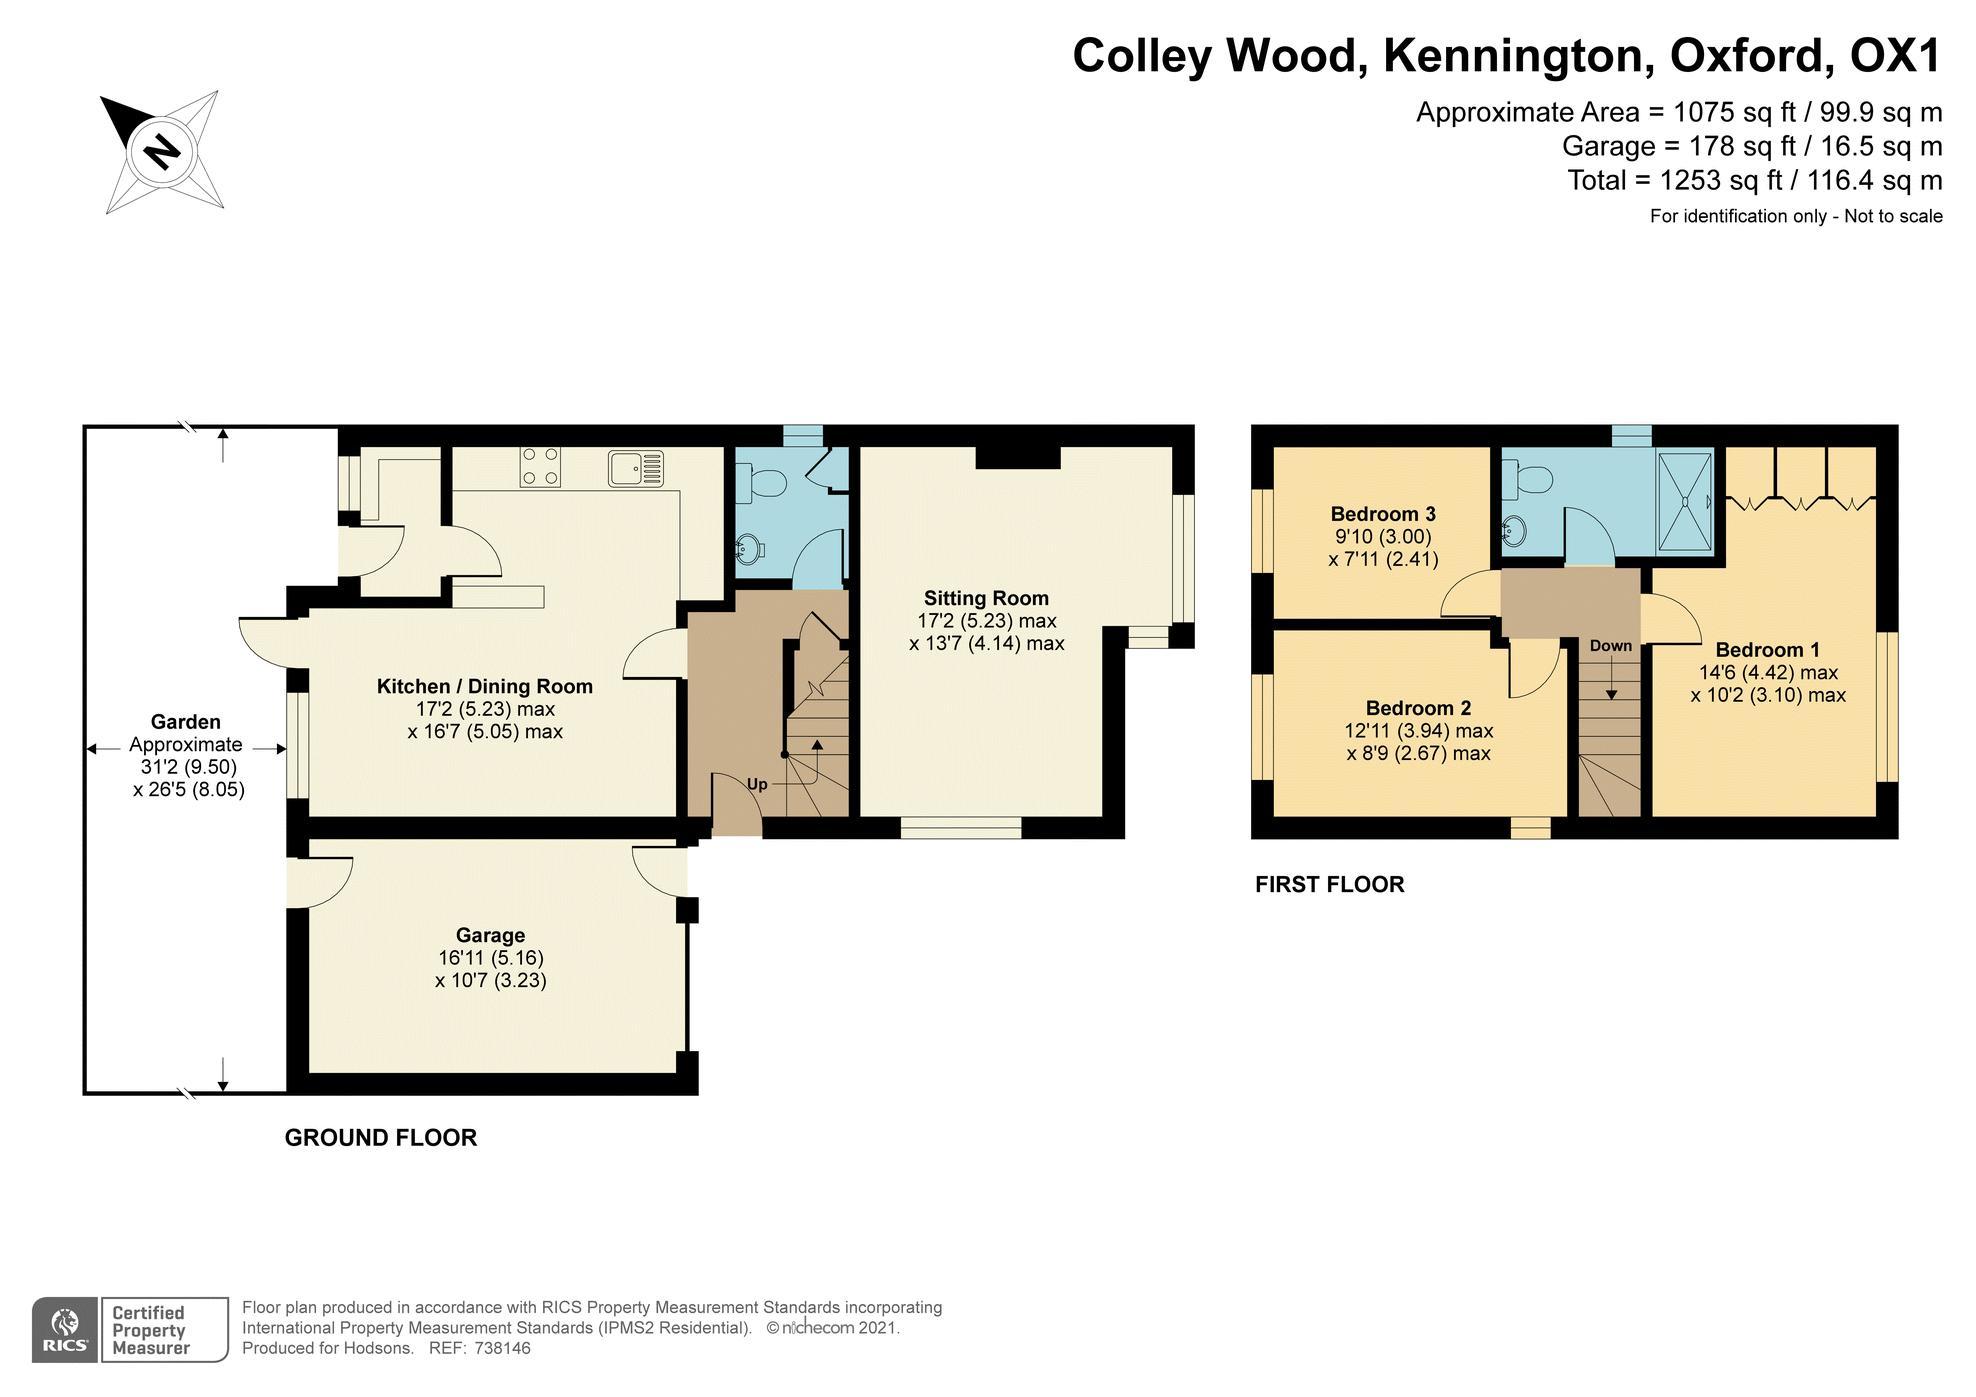 Colley Wood Kennington